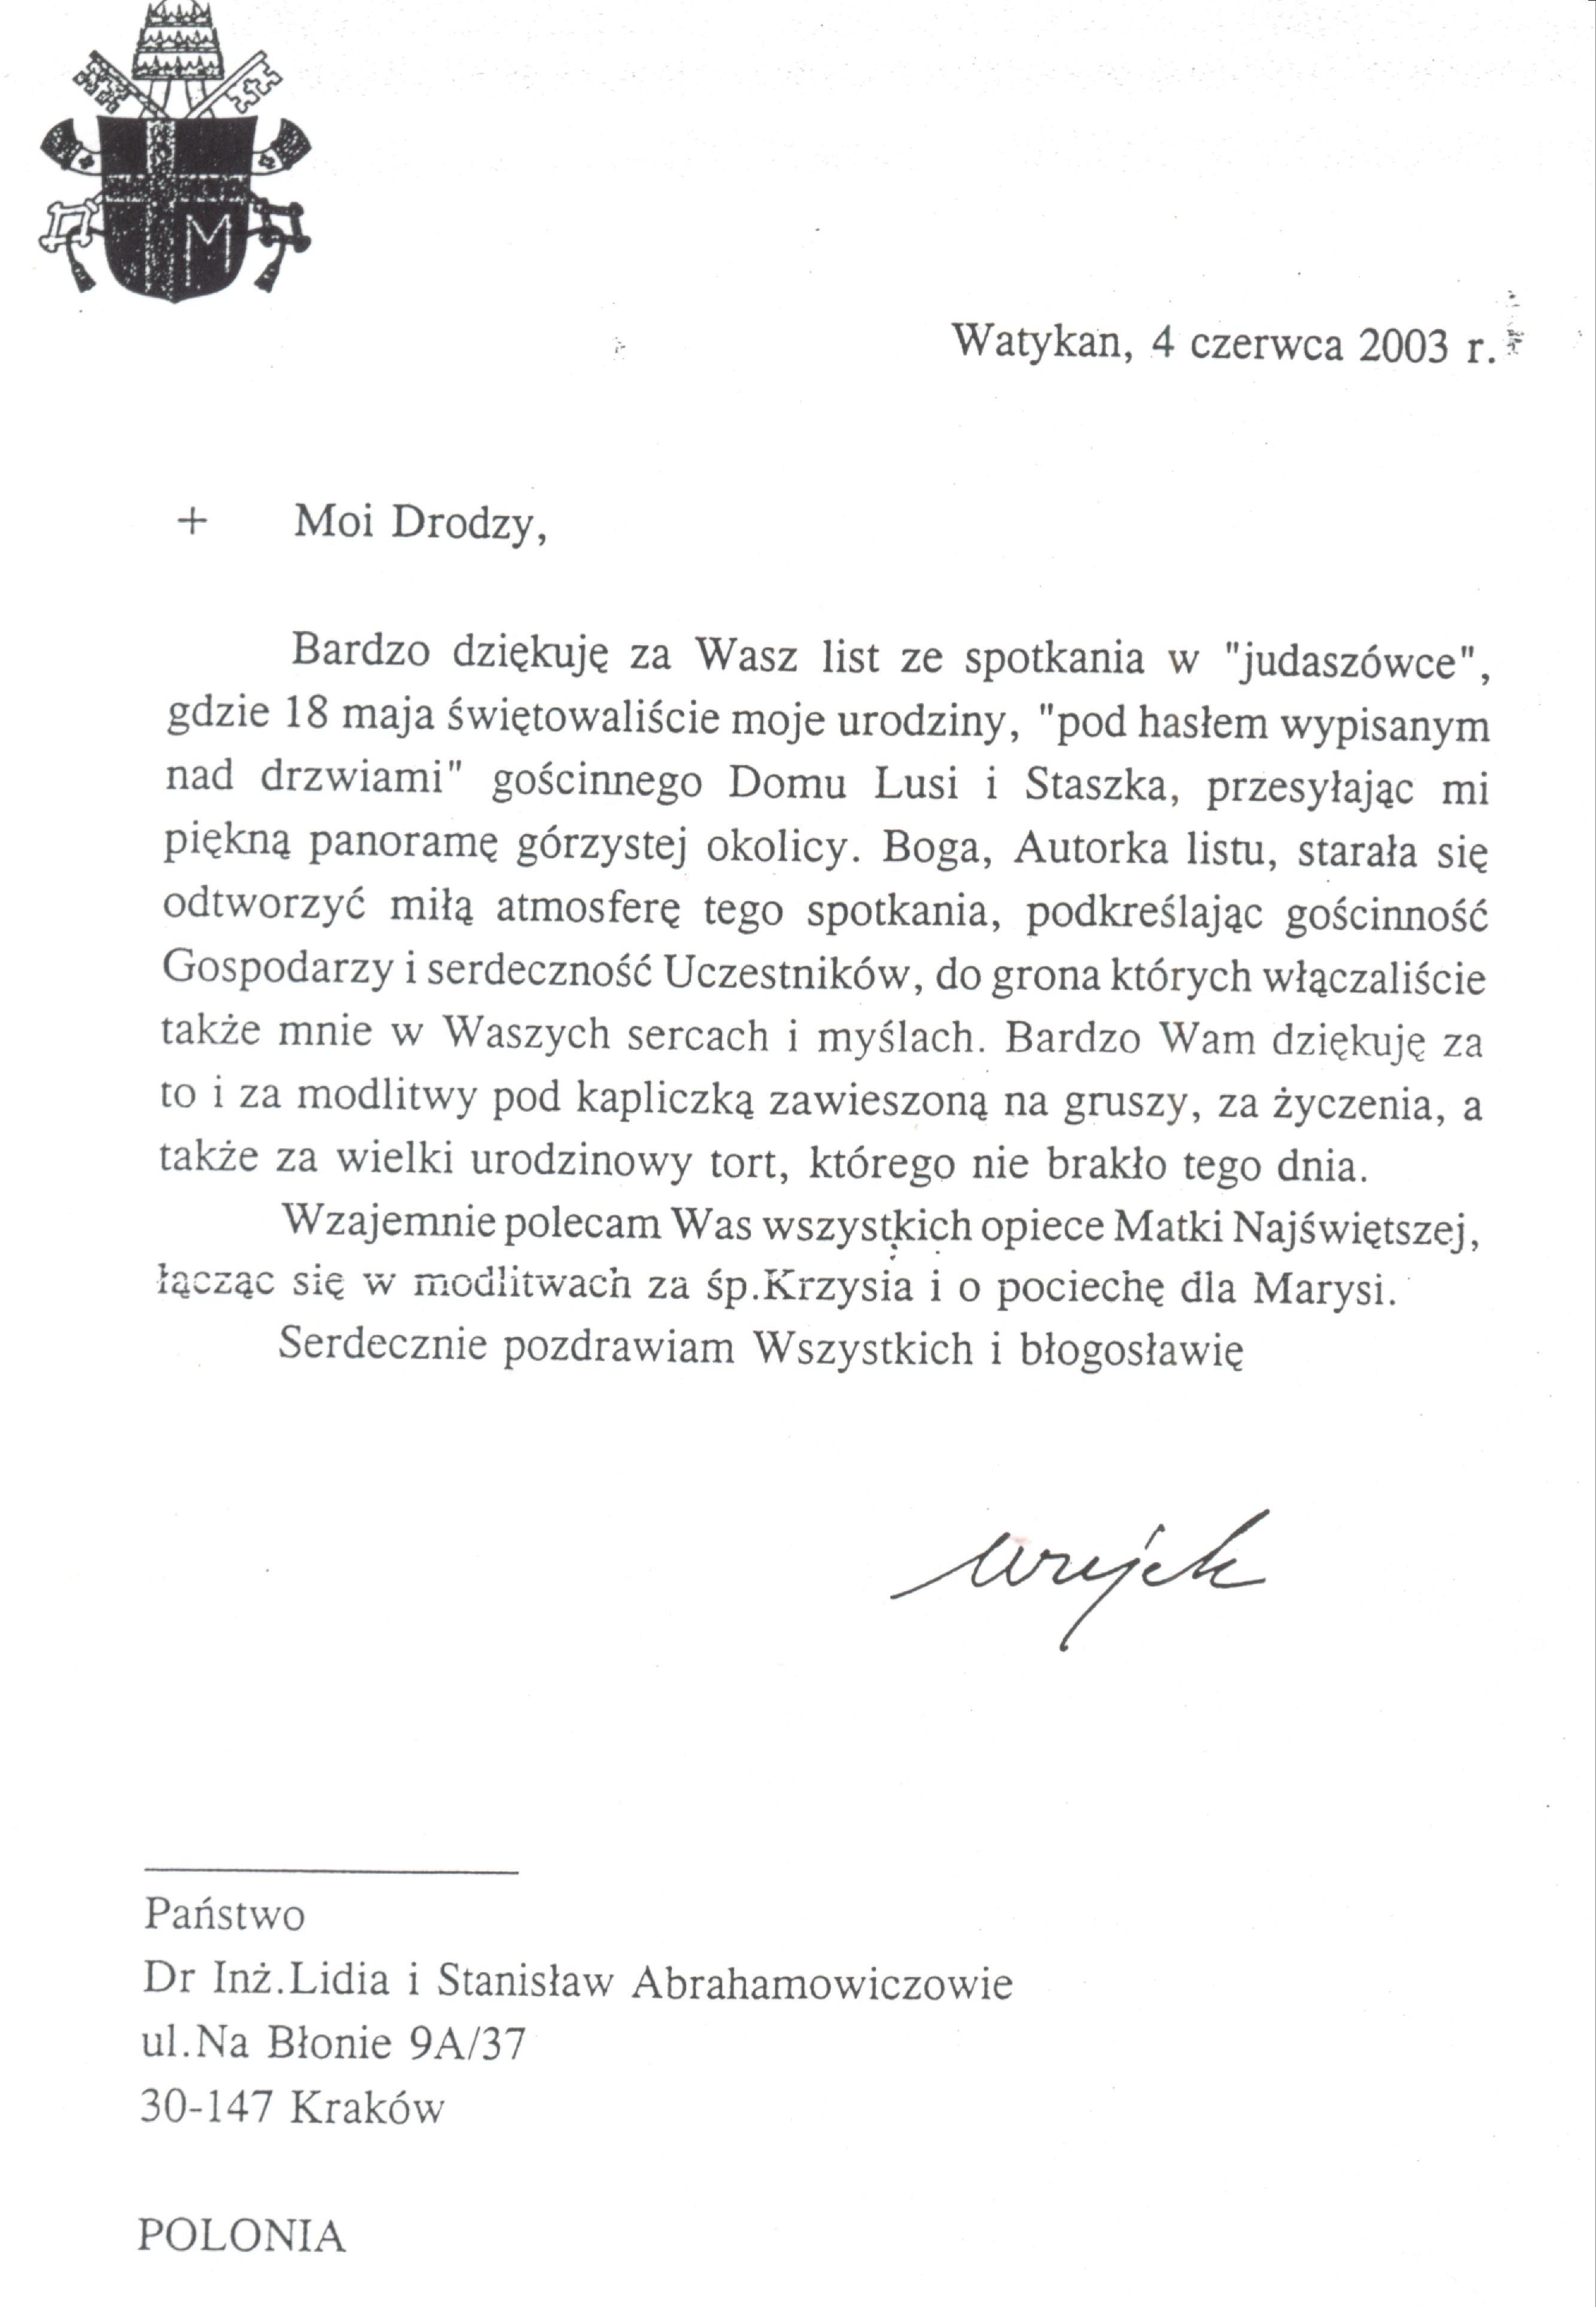 List z Watykanu